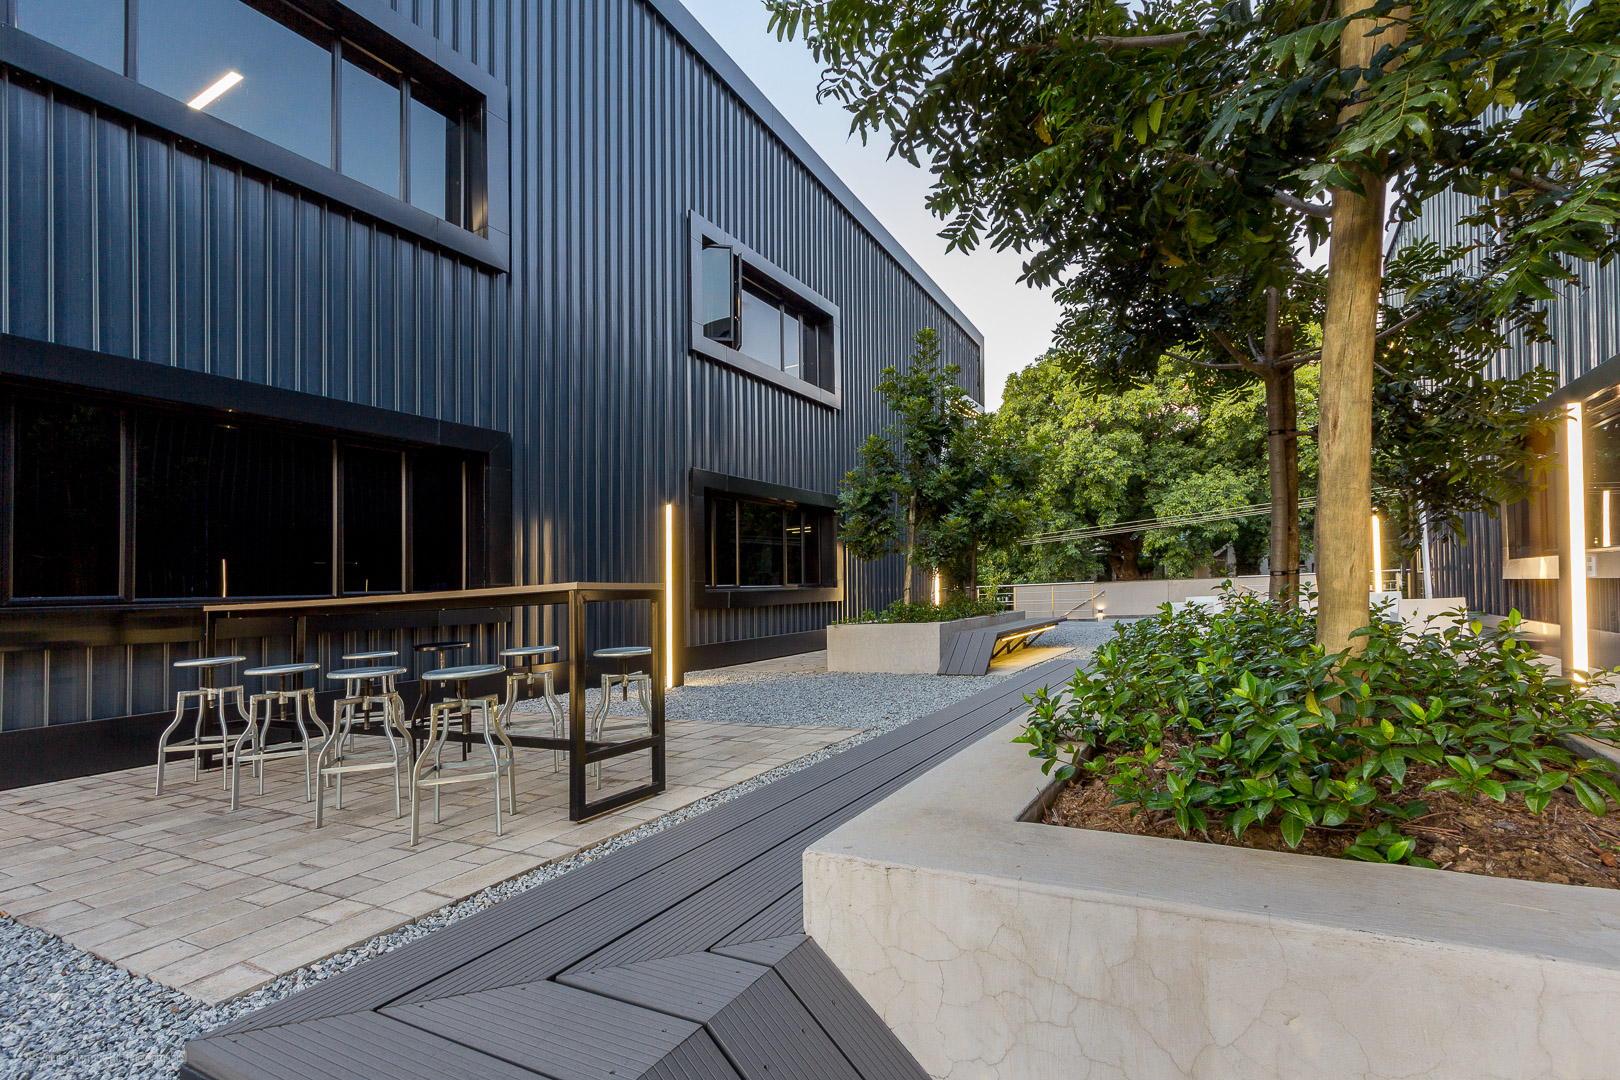 RHPX_Portfolio_Holt Street Parkmore-10